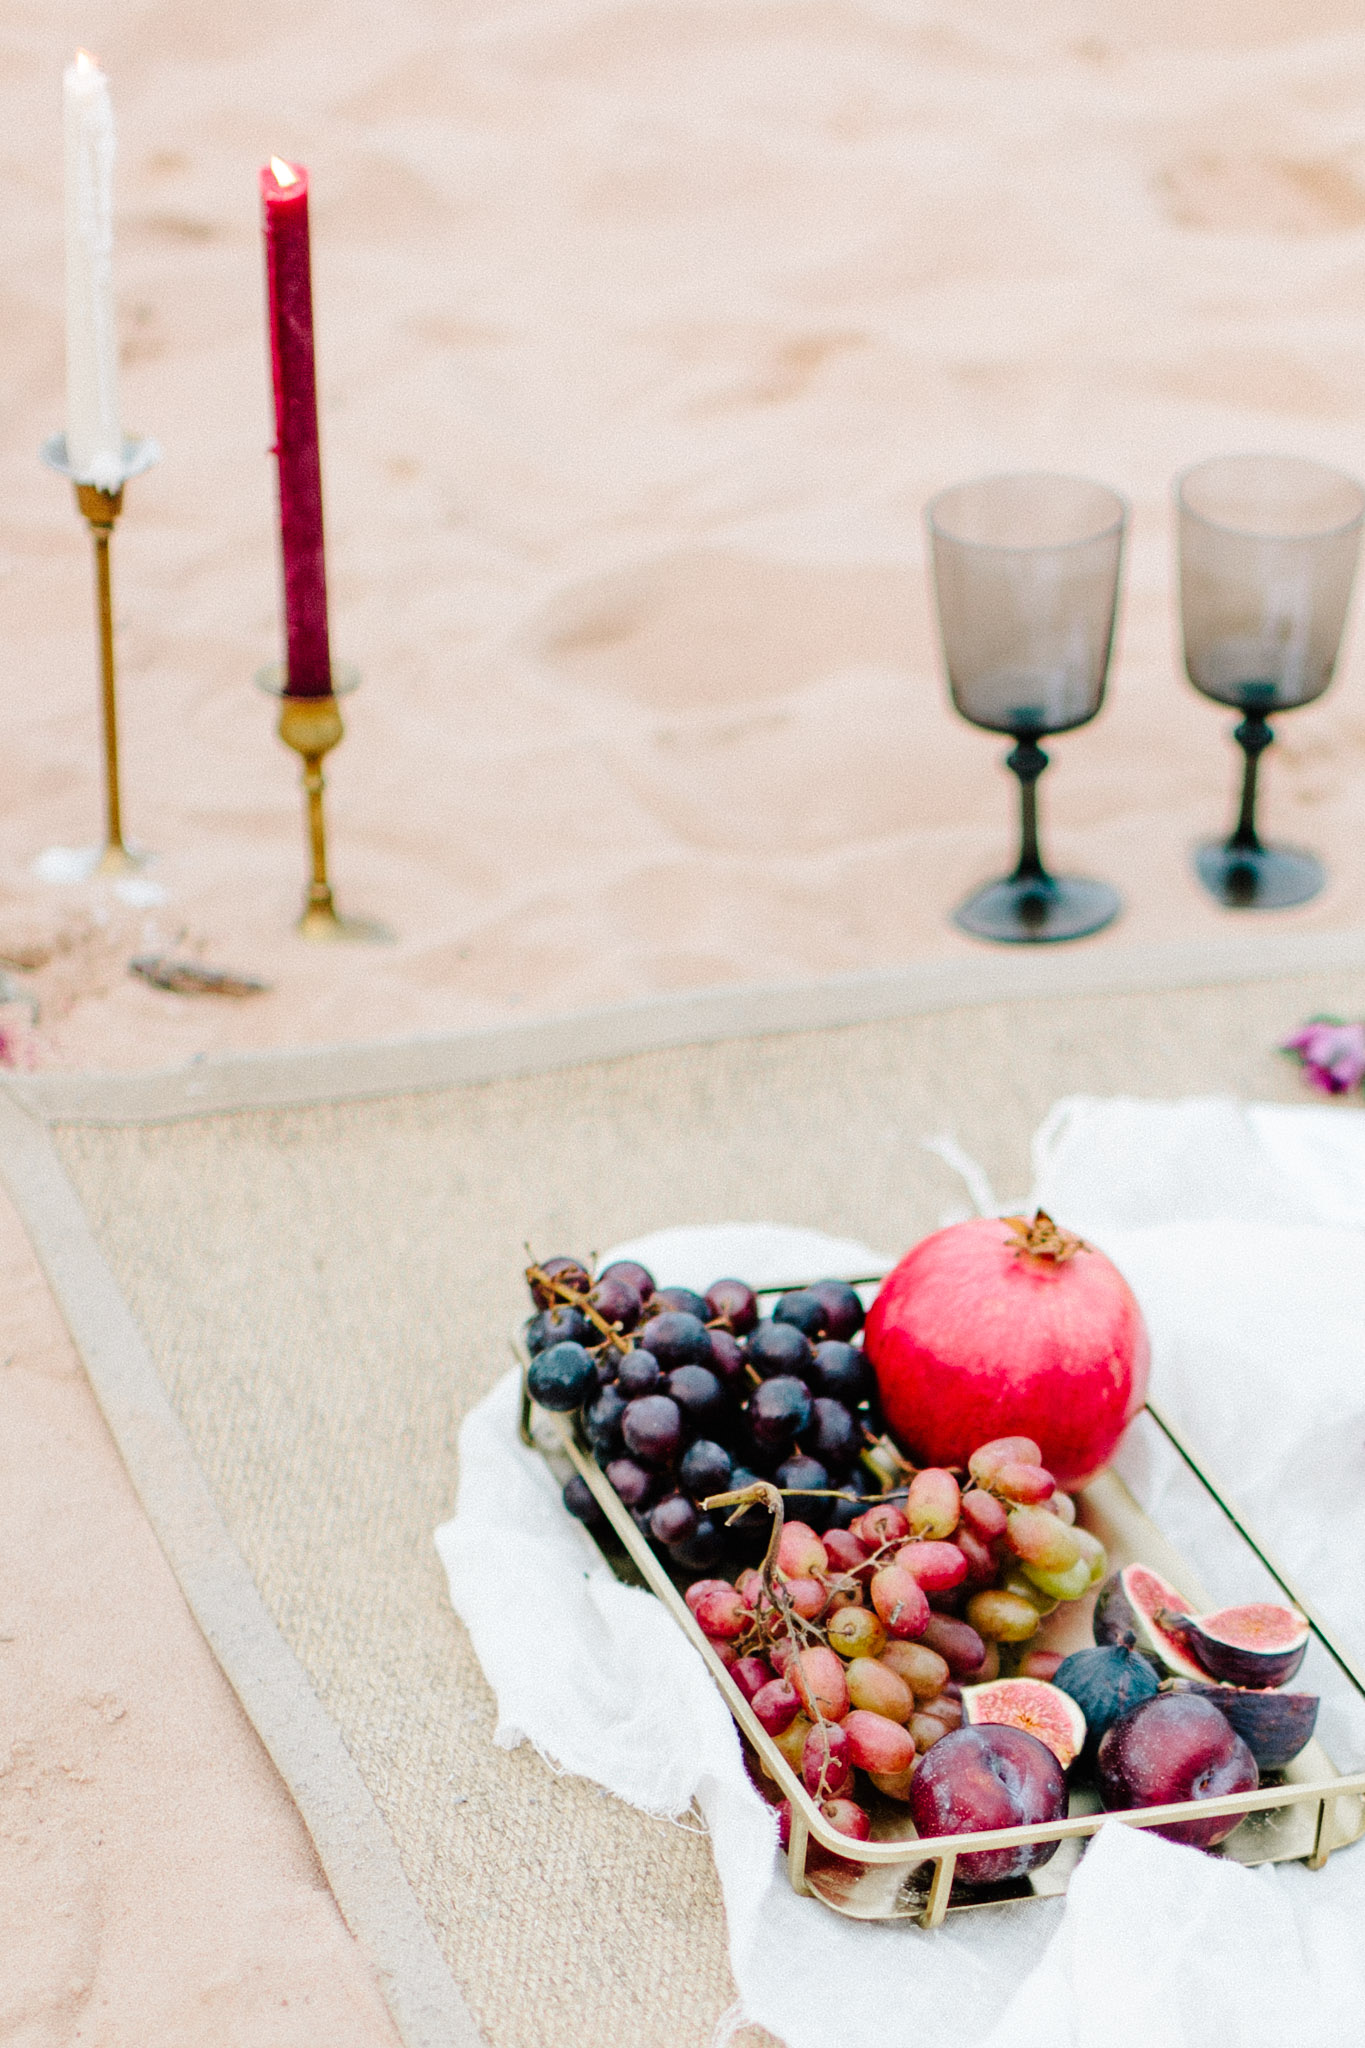 Speyer-Moroccan-Wedding-Inspiration-Pia-Anna-Christian-Wedding-Photography-S-41.jpg